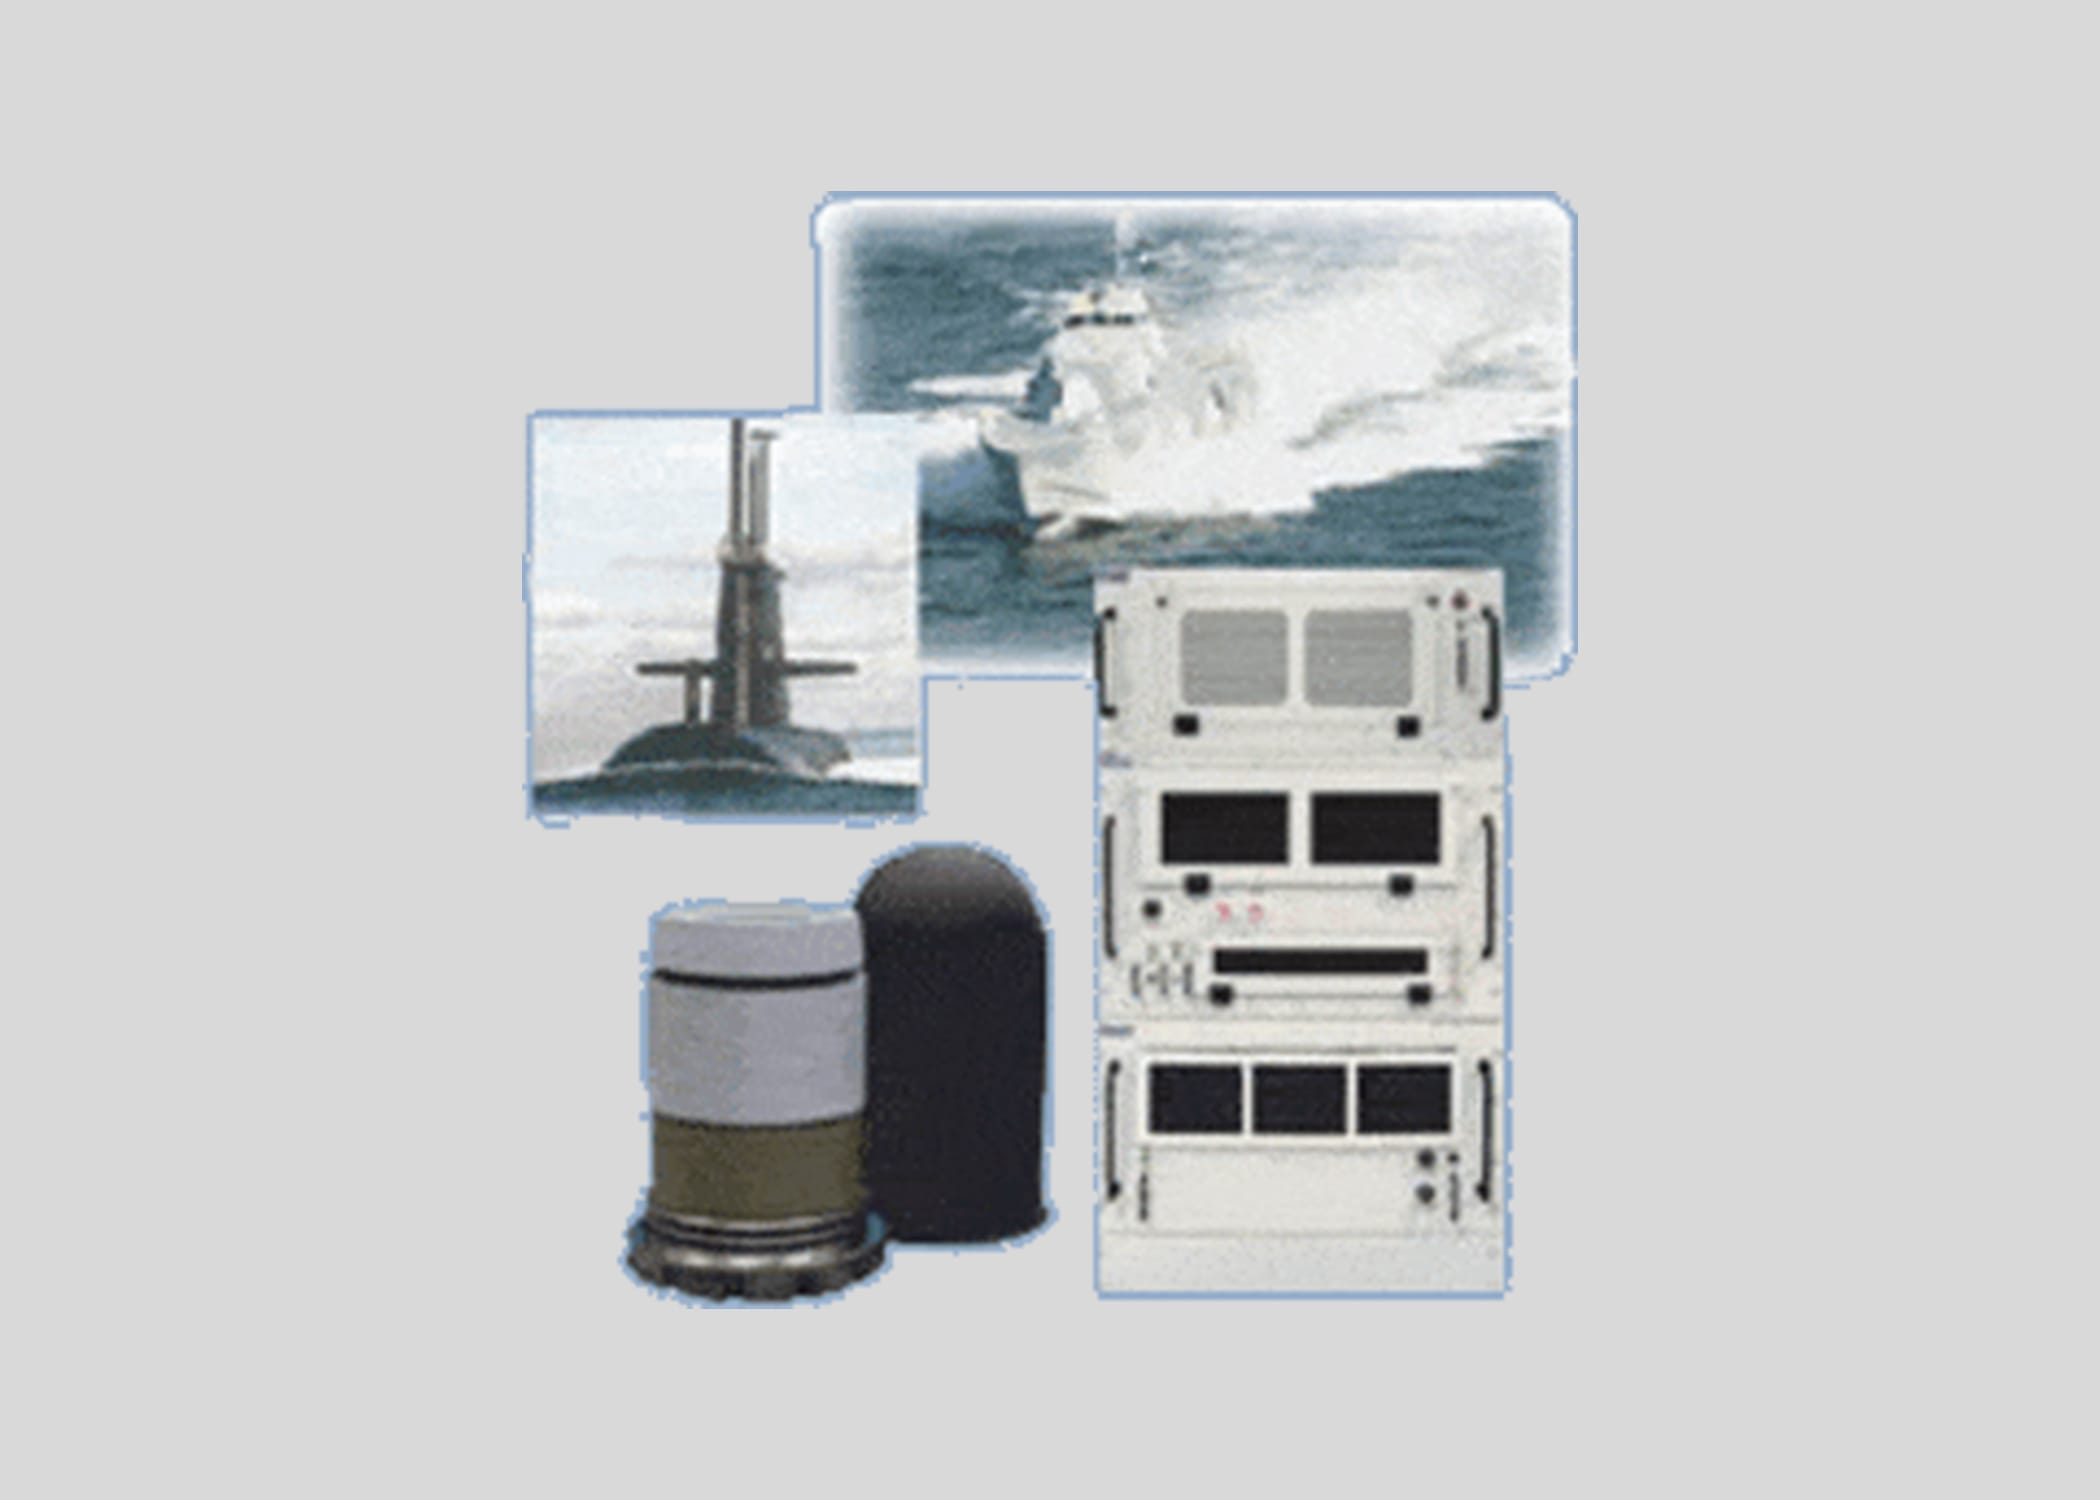 CS-3701 Circular Array Interferometer ESM System